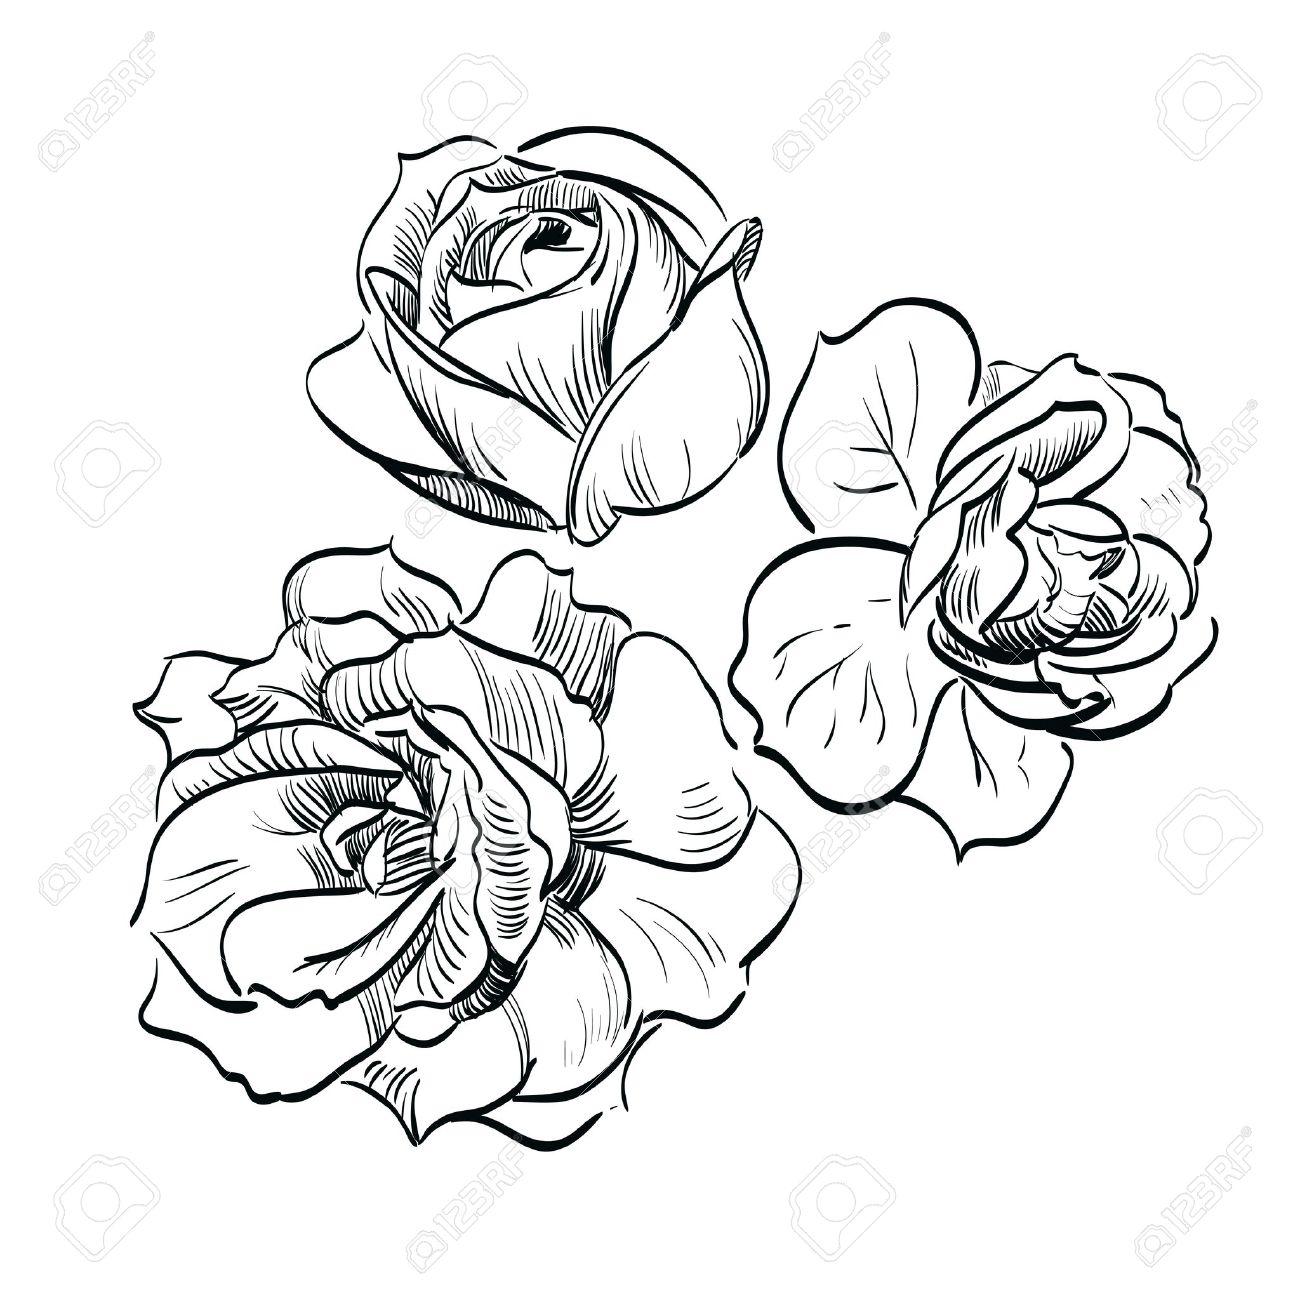 1300x1300 Dongetrabi Black Rose Drawing Images